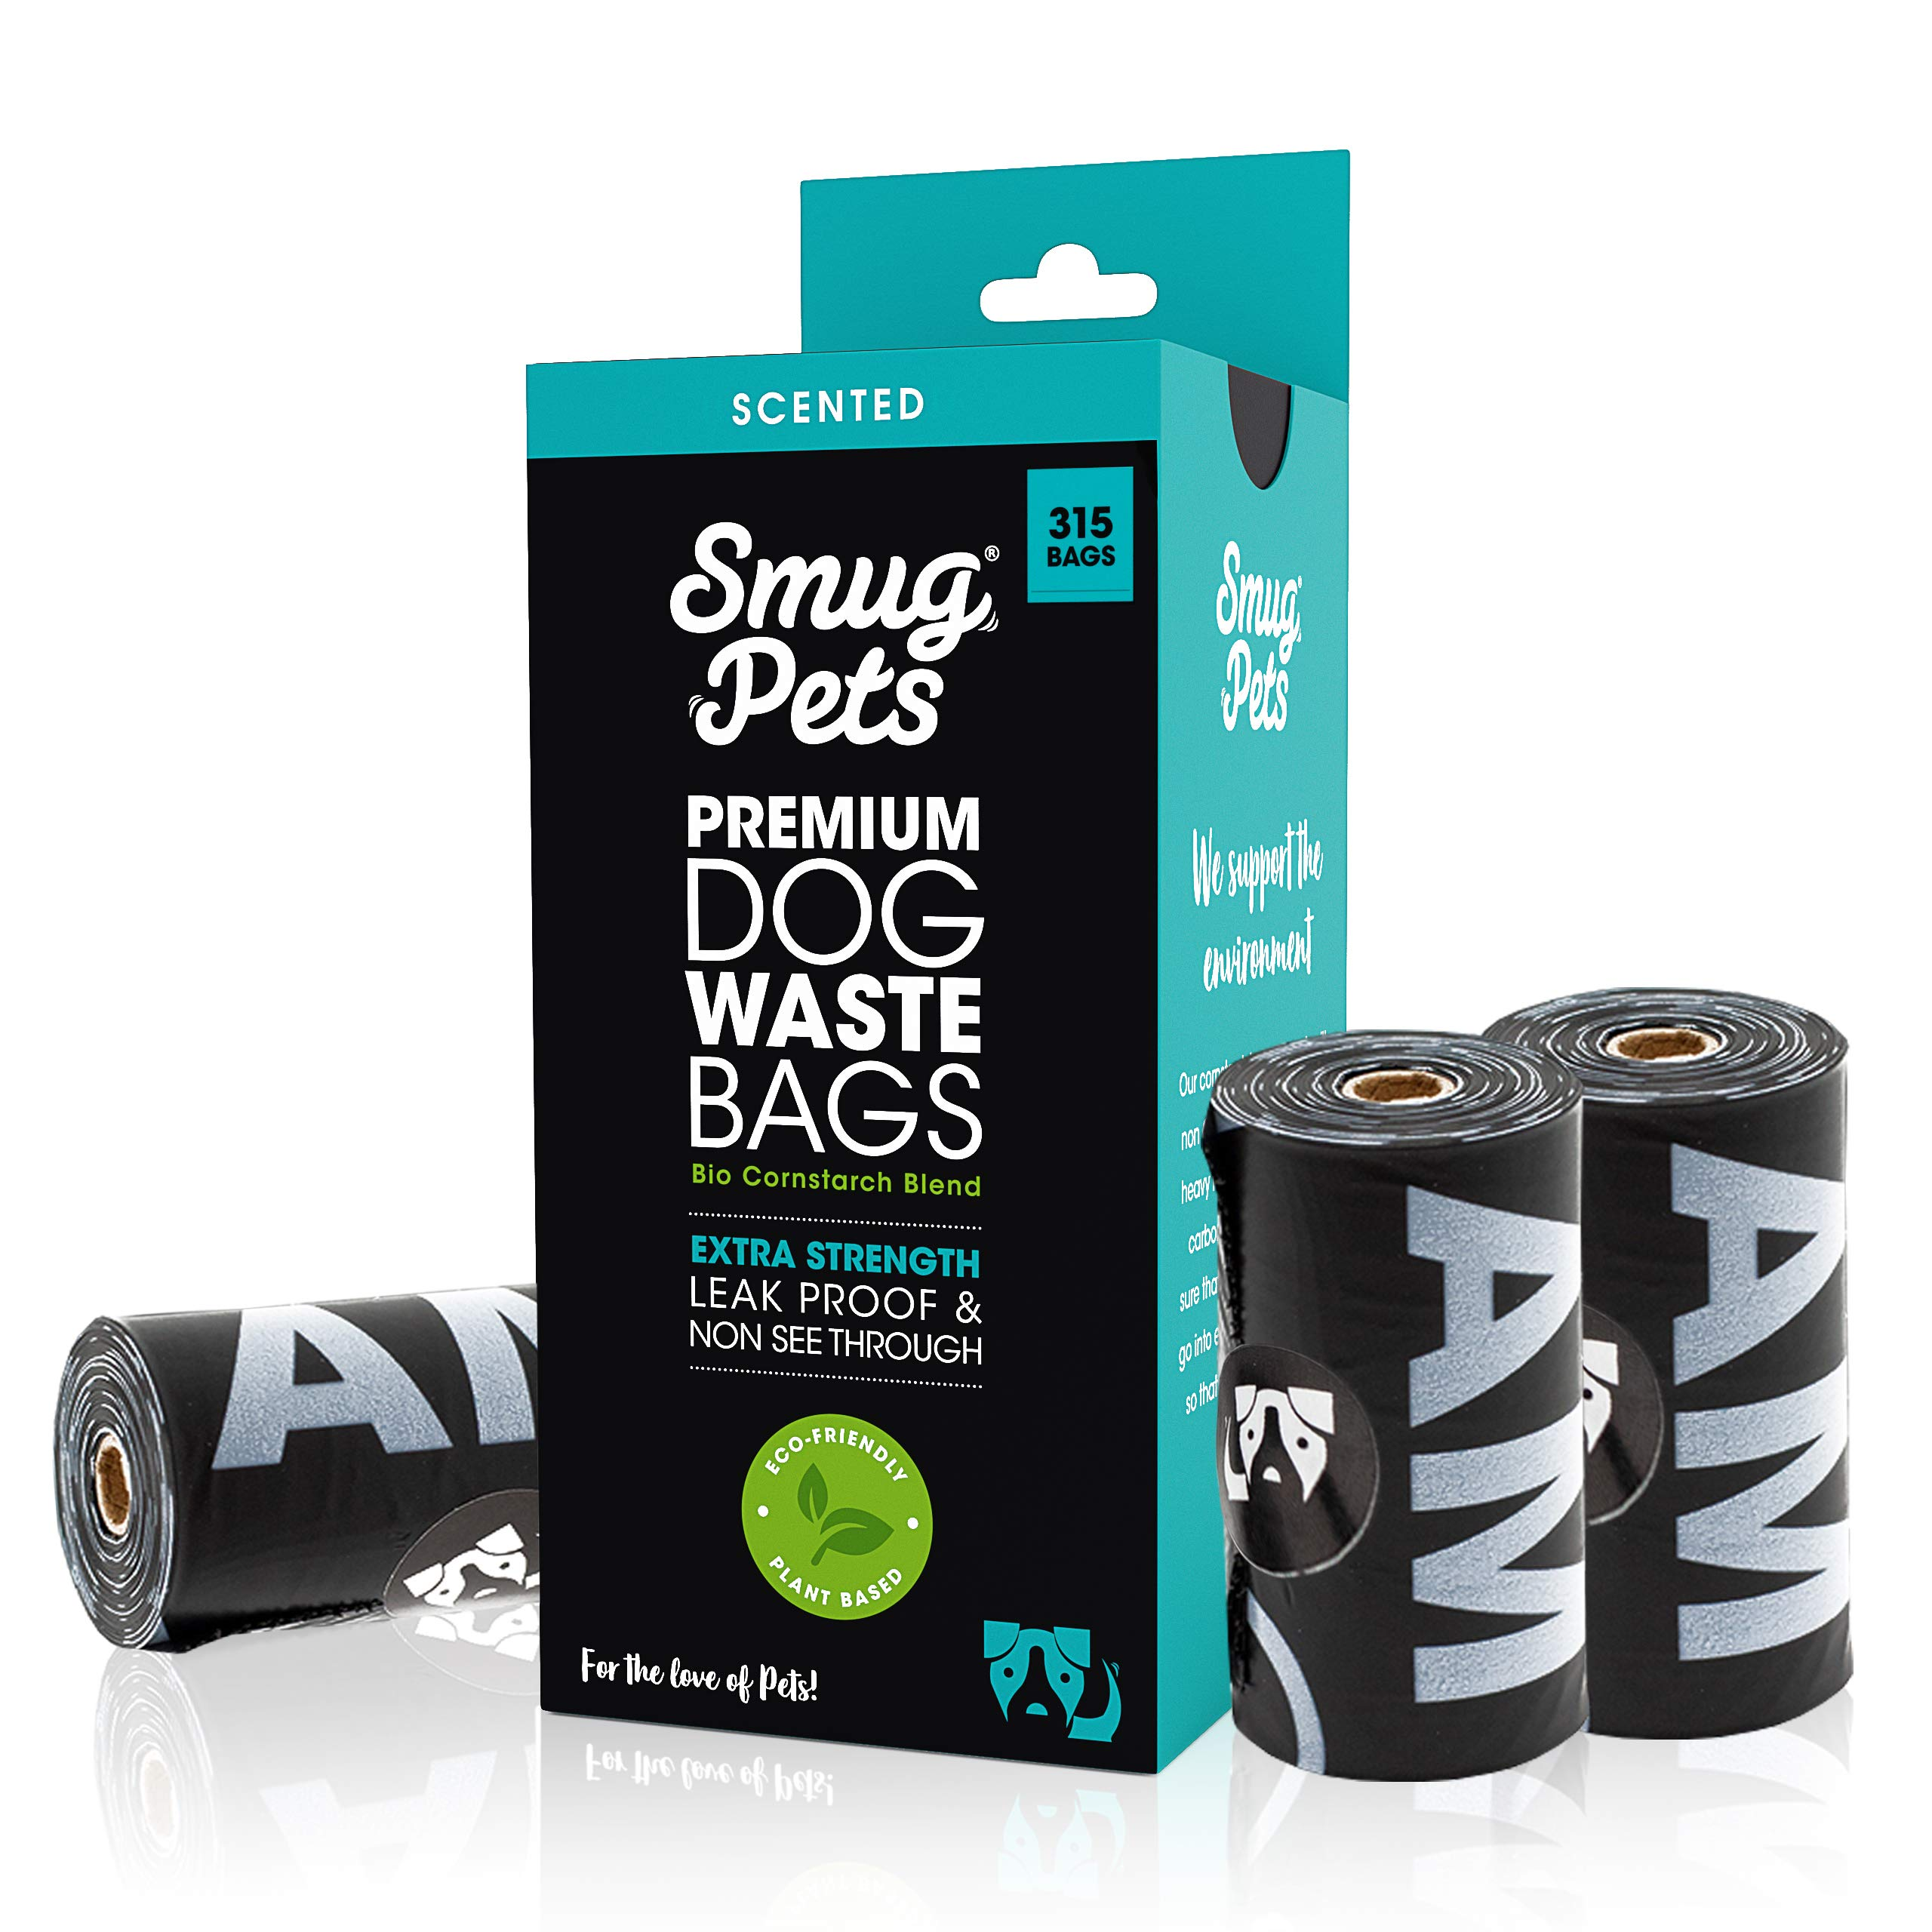 SmugPets - 315 Bolsas biodegradables para excrementos - Extragrandes y perfumadas product image